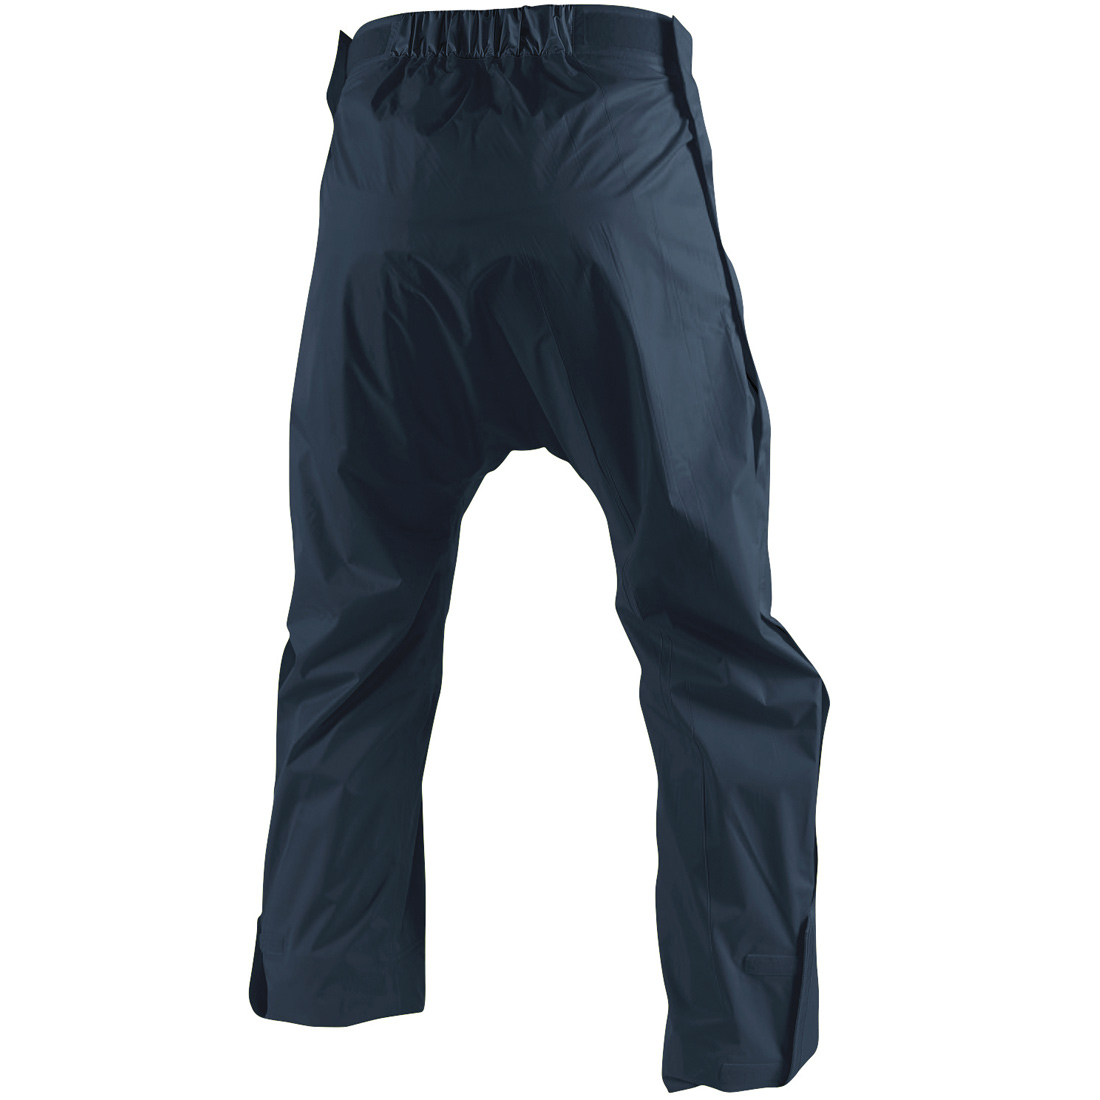 【DAINESE】D-CRUST PLUS 車褲 - 「Webike-摩托百貨」